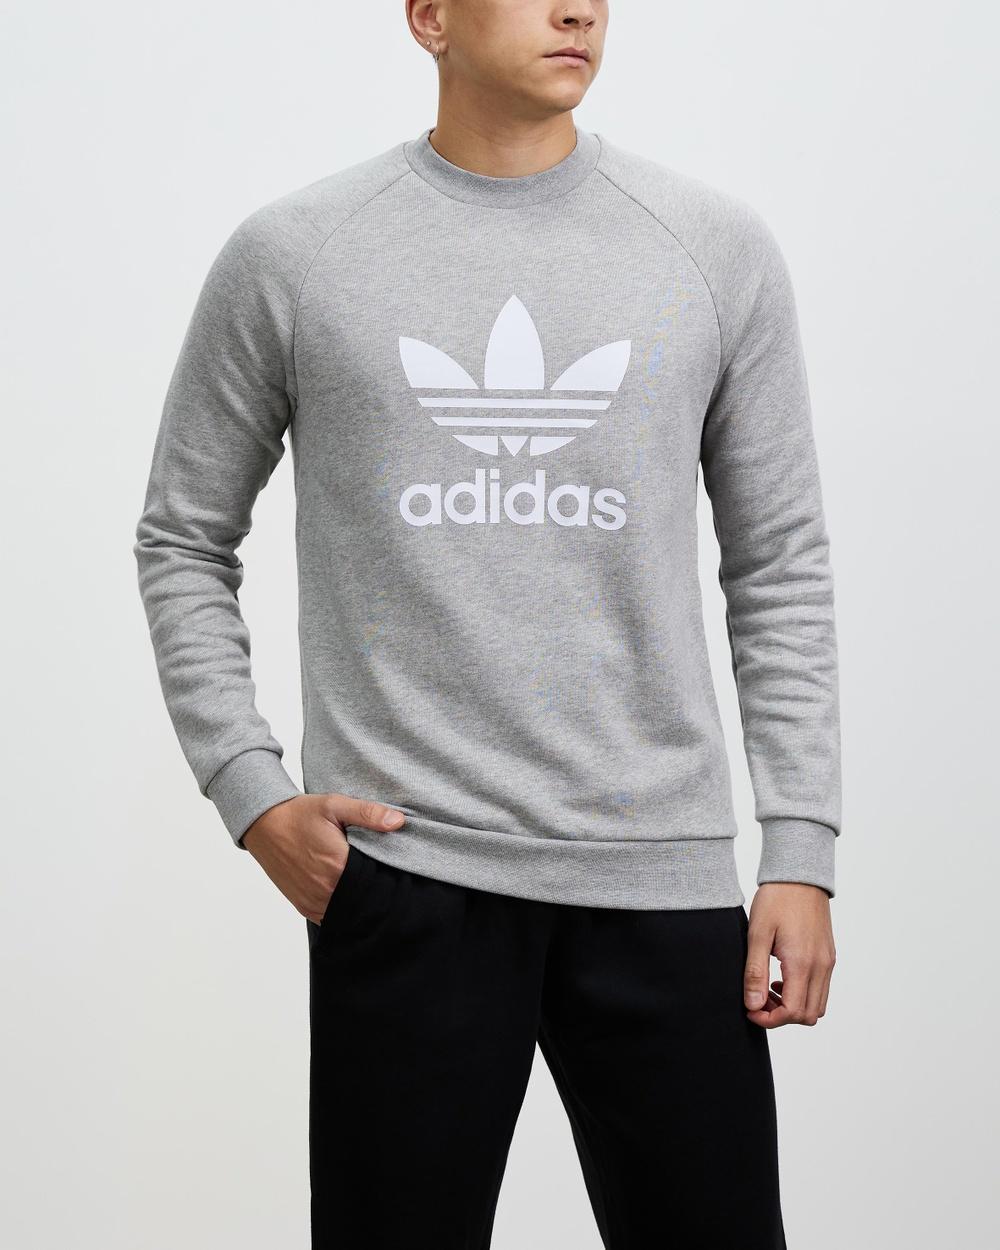 adidas Originals Adicolour Trefoil Crew Sweatshirt Necks Grey Heather & White